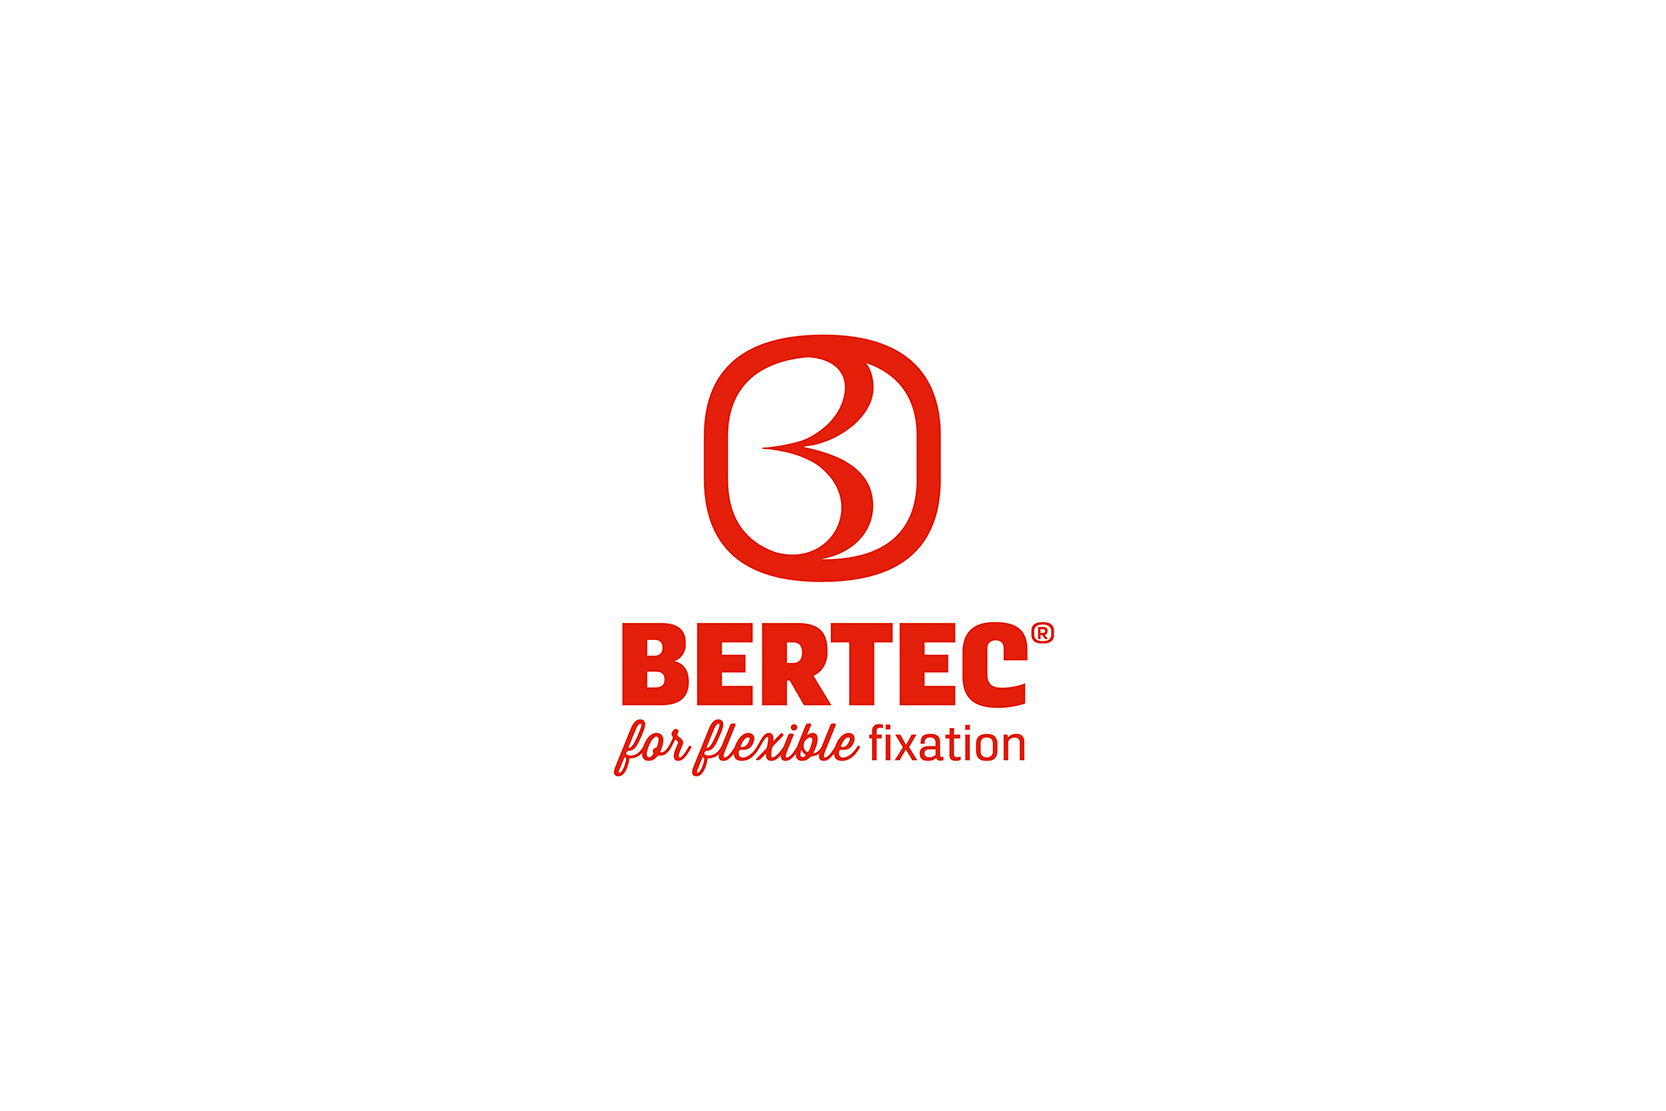 Bertec